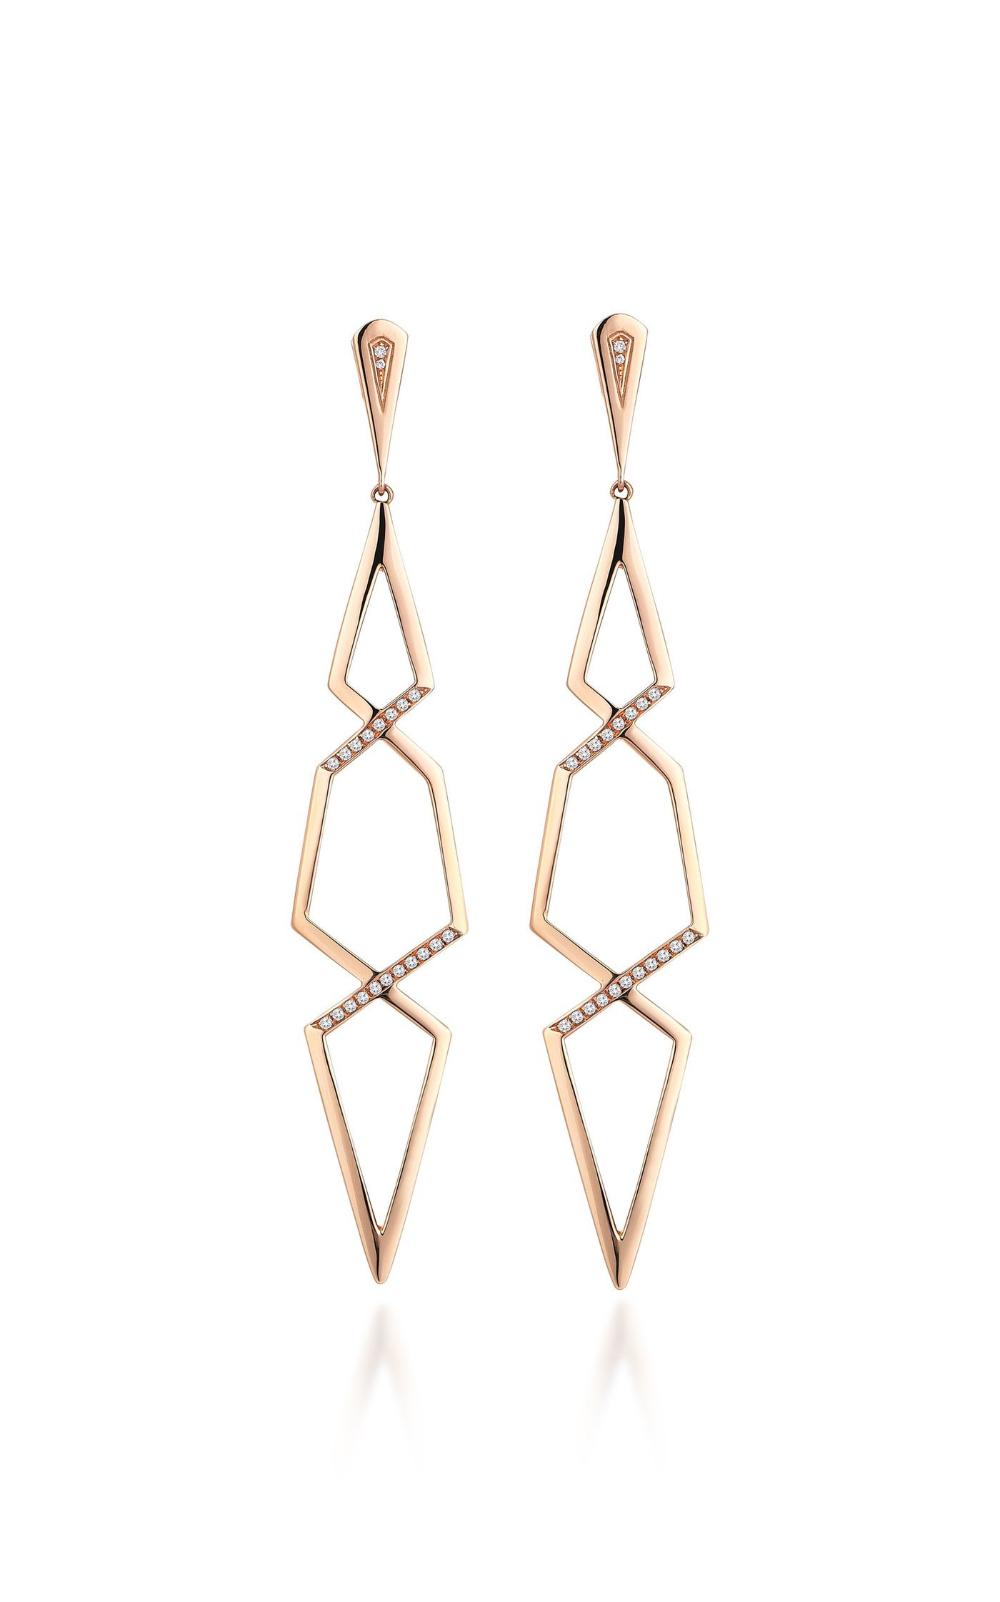 Altuncan 18k Rose Gold Diamond Earrings By Gilan | Moda Operandi